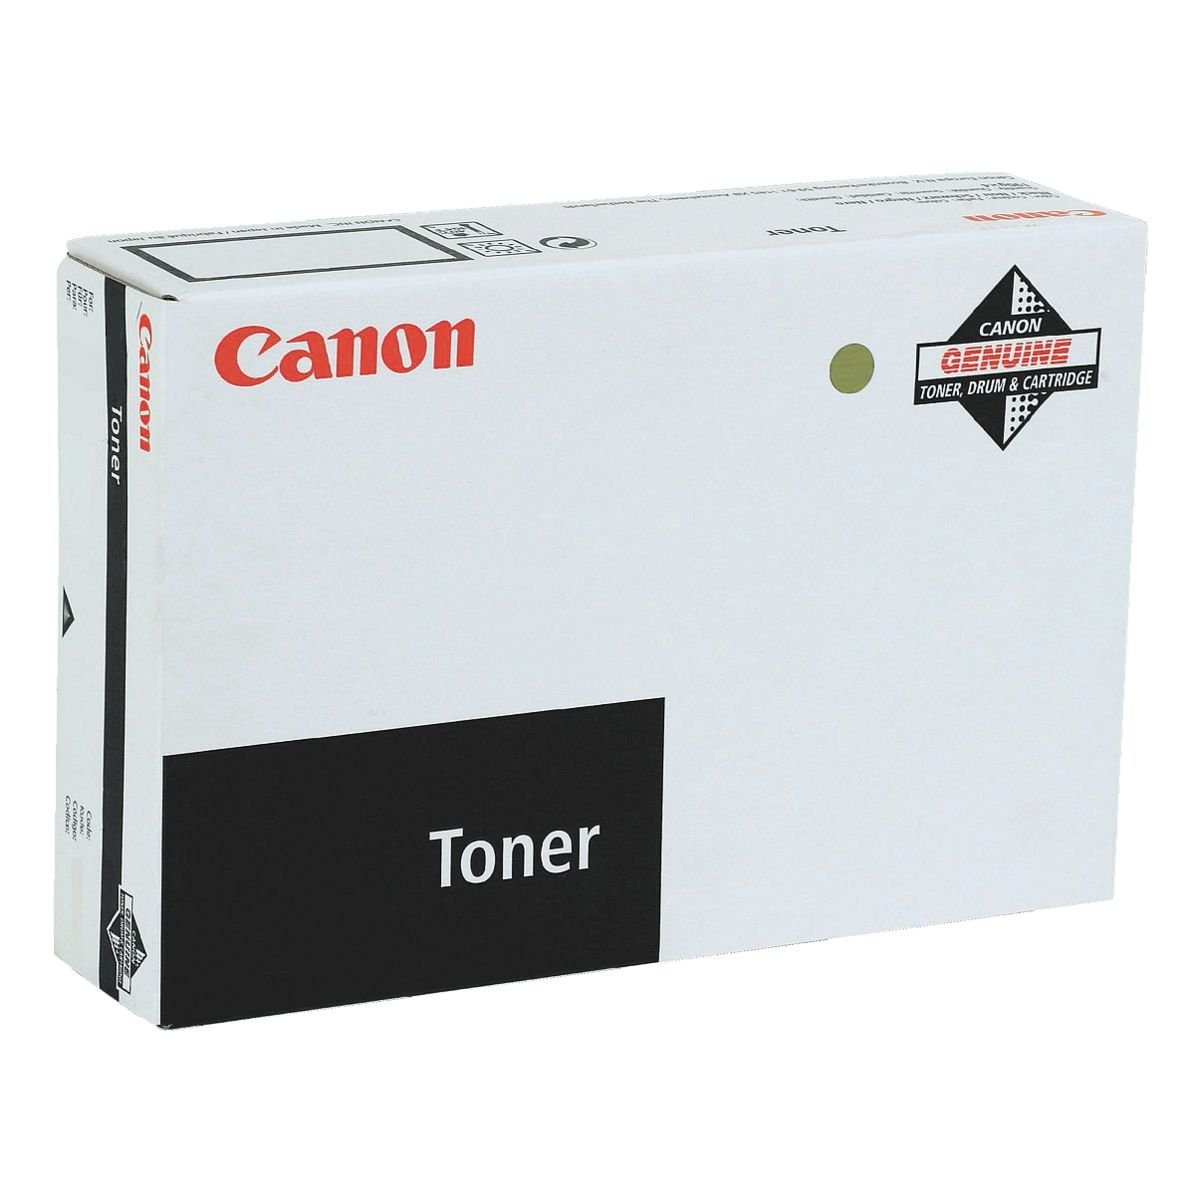 Canon Toner-Set »F41-6601« & »F41-6600«